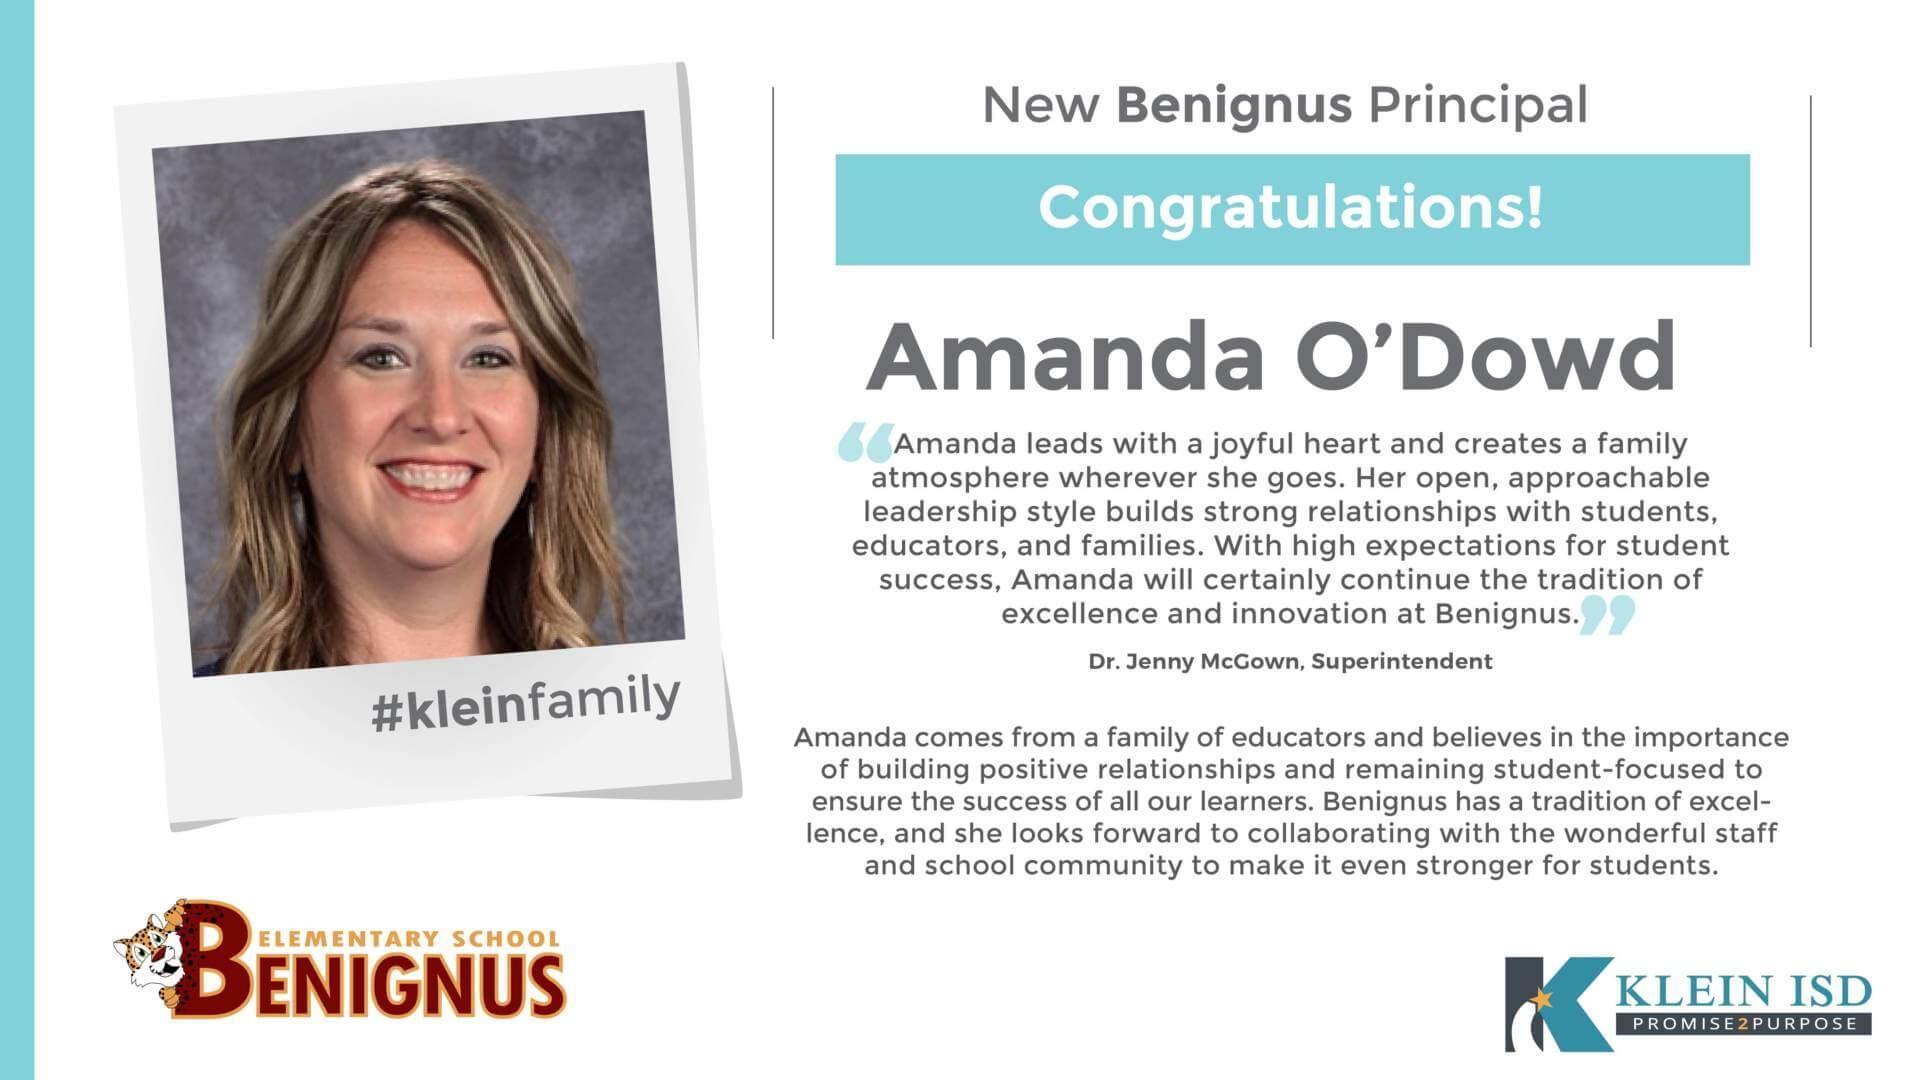 Amanda O'Dowd Announced as Benignus Elementary Principal